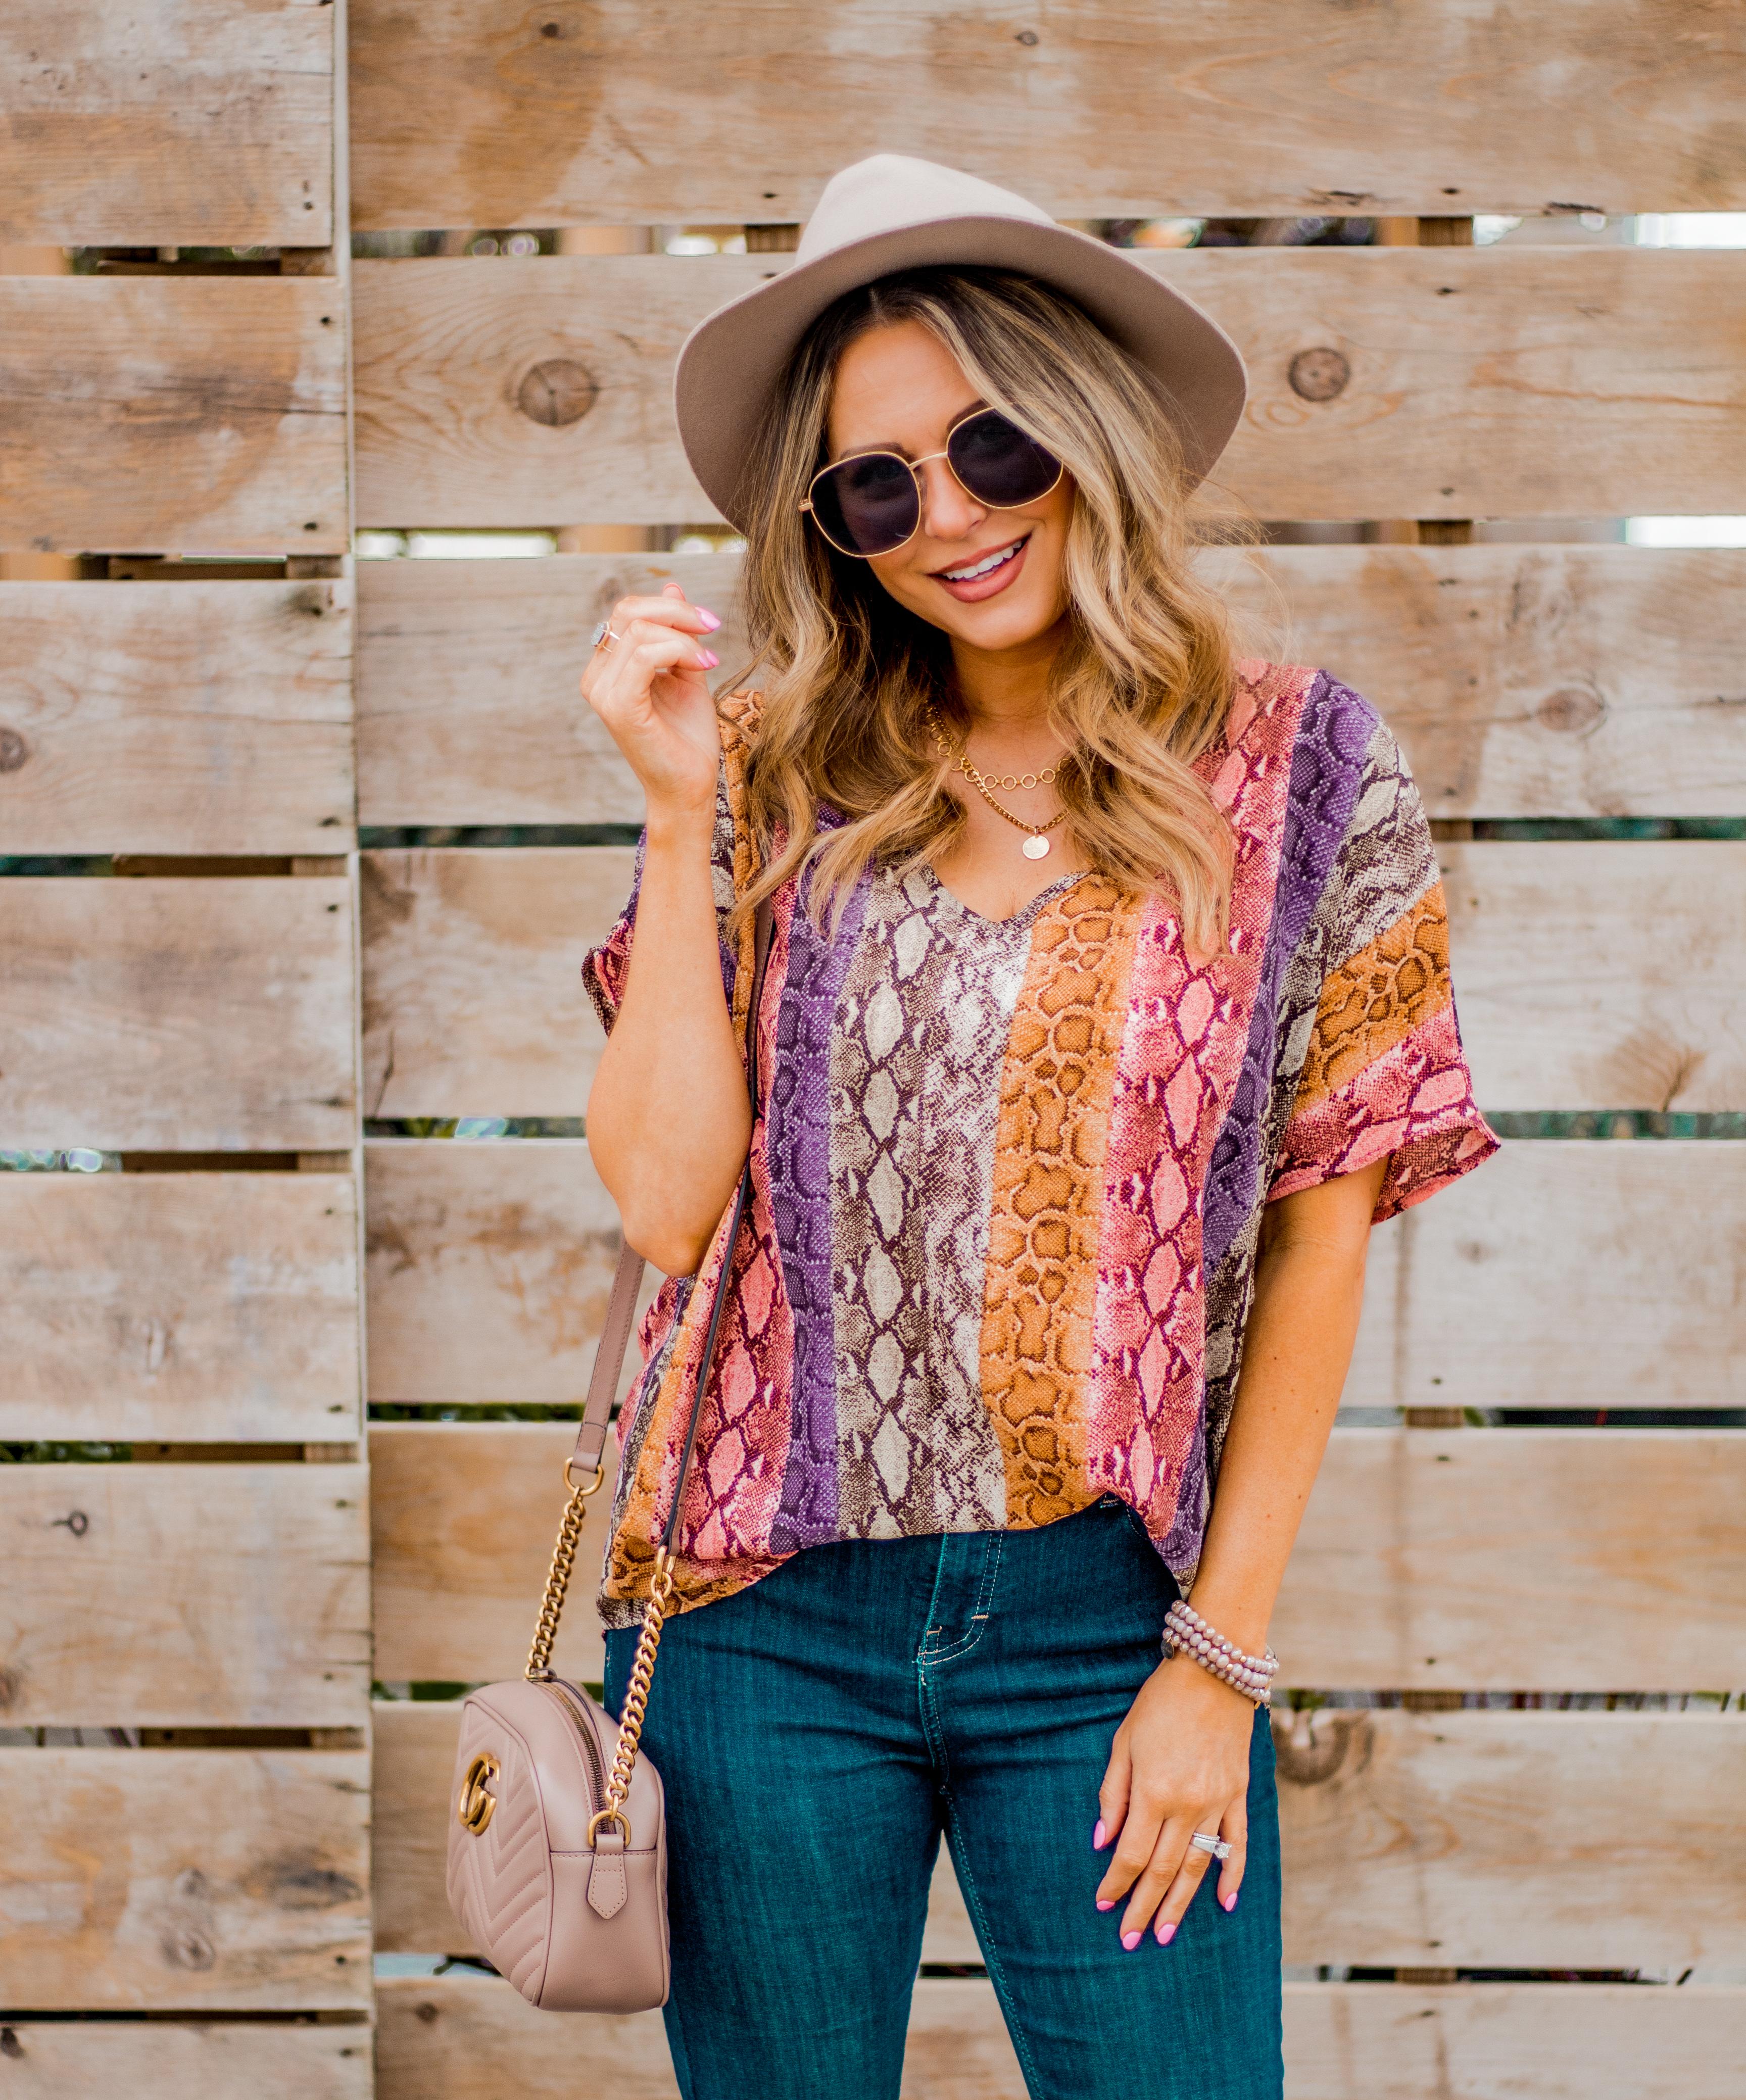 Women's Fashion - Snakeskin Print - Snakeskin Trend - Spring Fashion Trend - Omaha Fashion Blog - Boho Vibes - Flare Jeans - 8